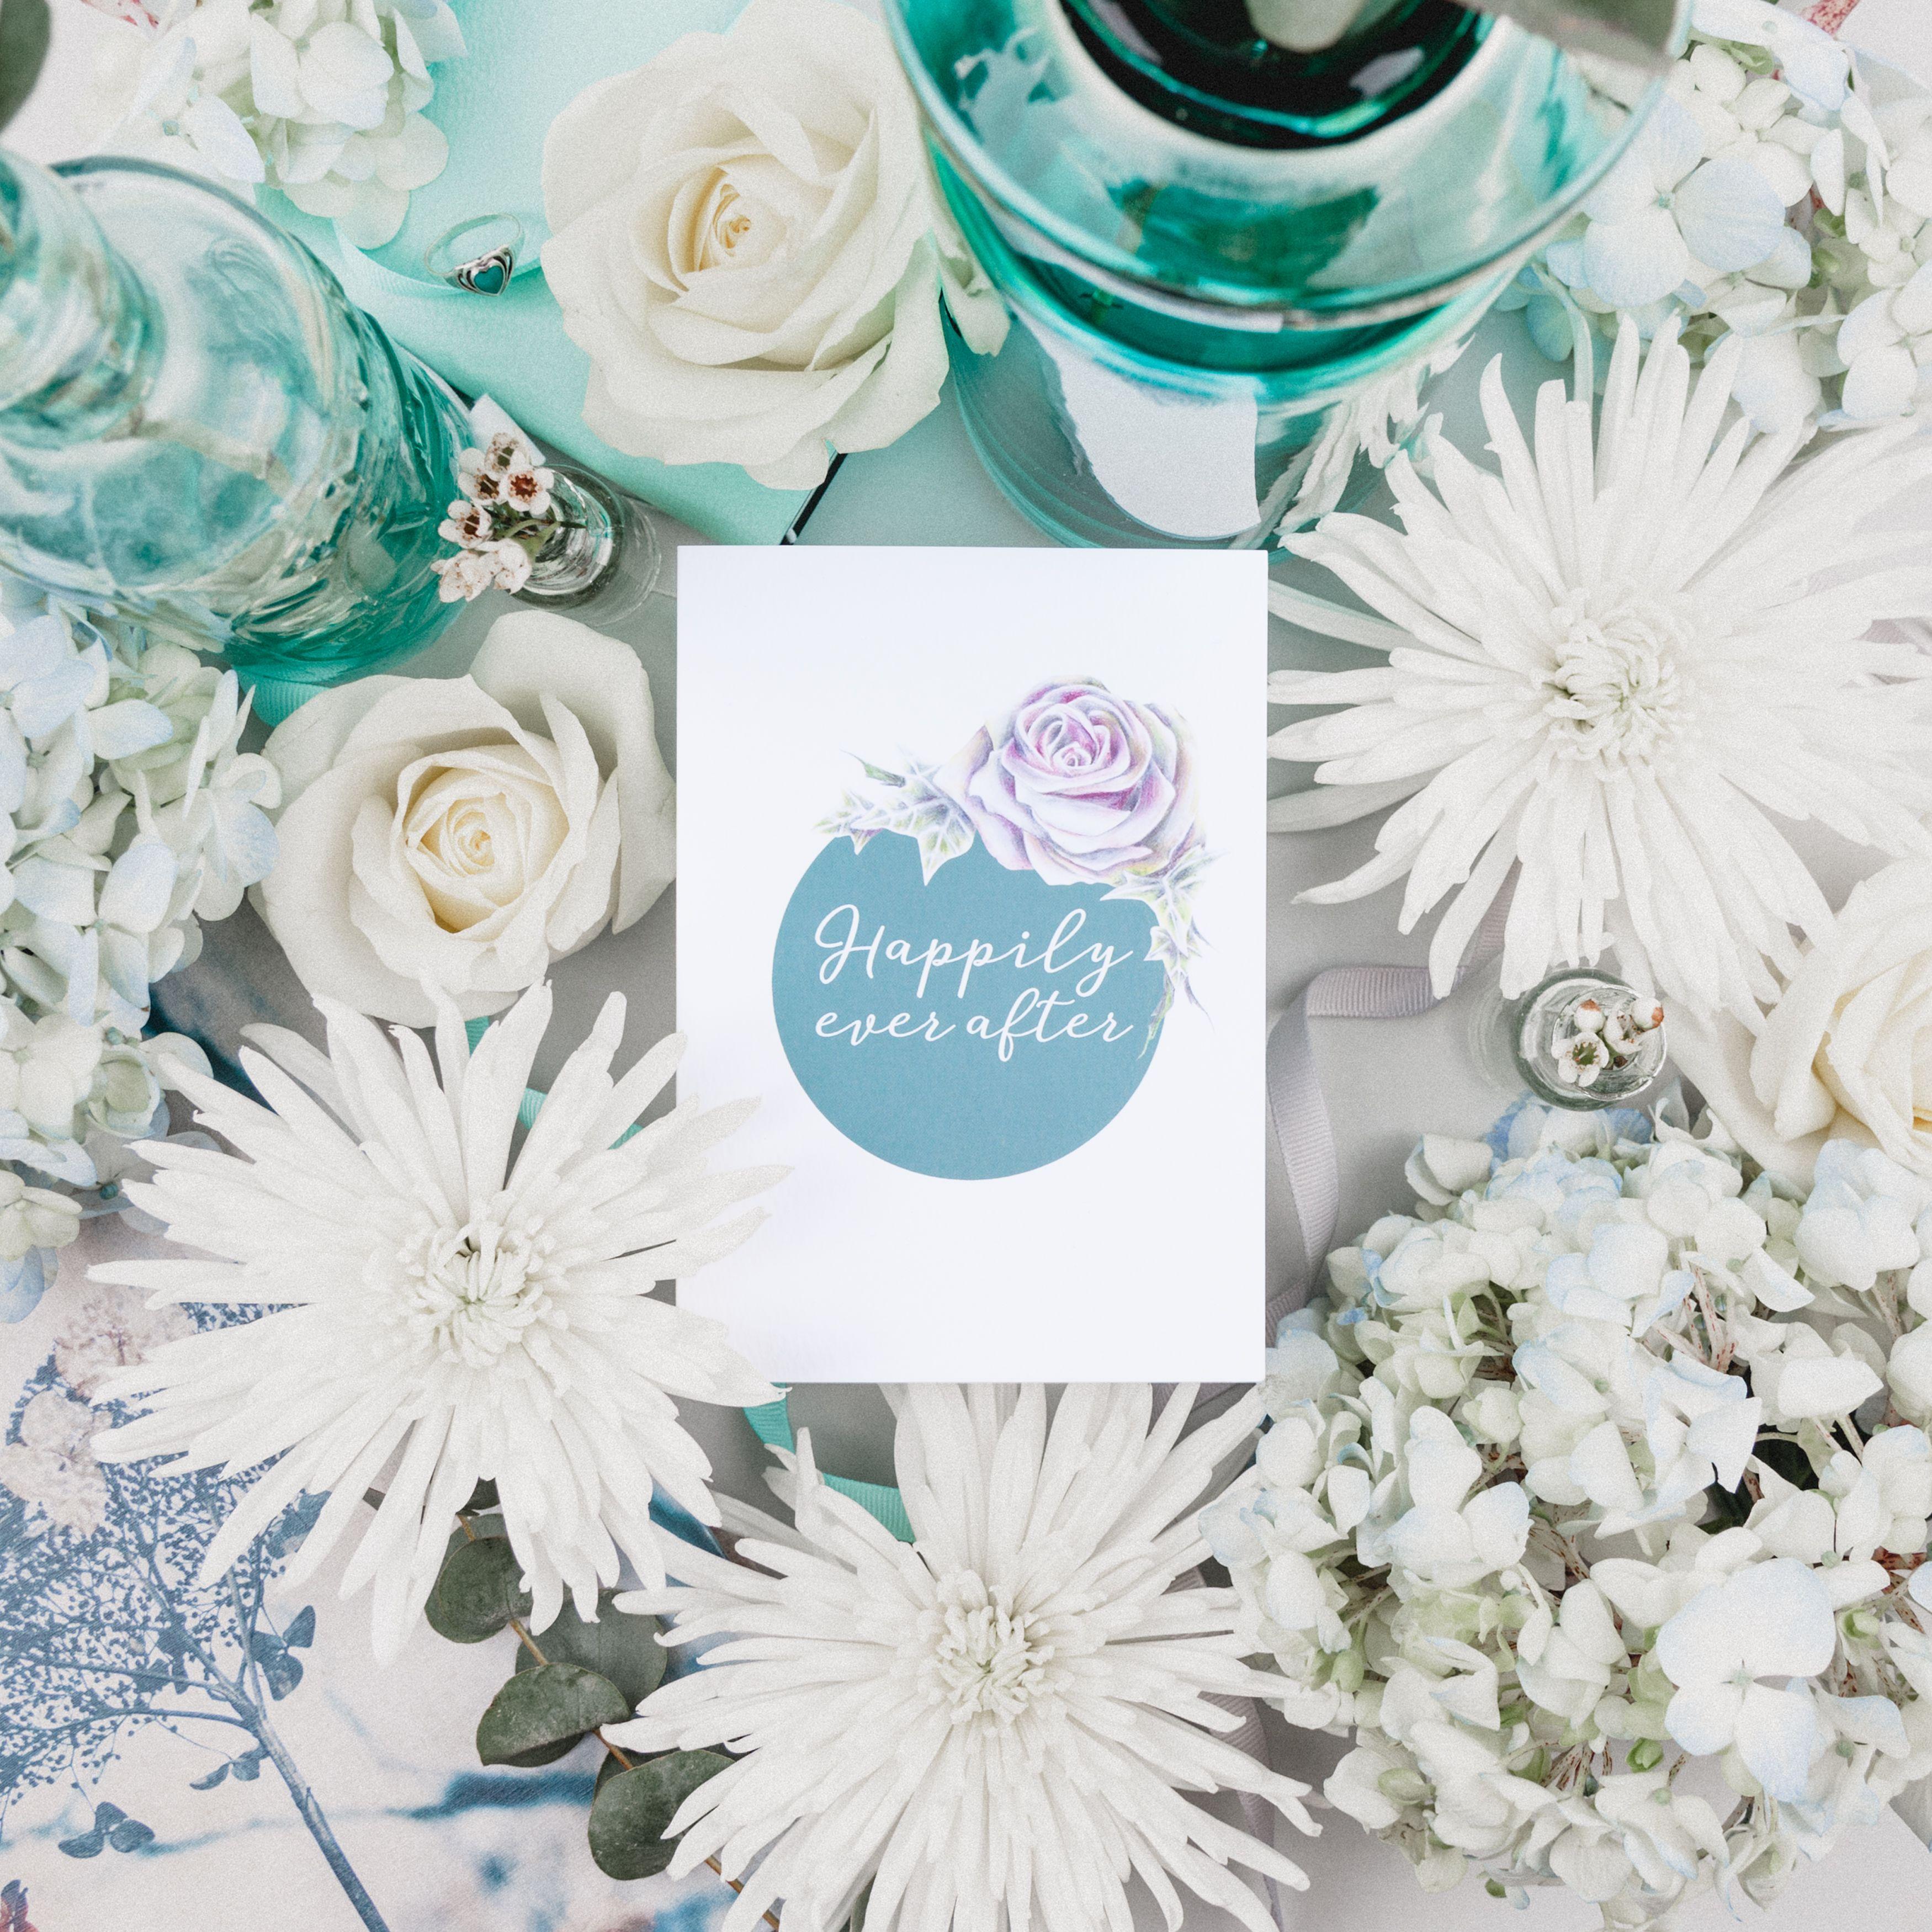 Wedding Bouquet Illustration Service voucher by botanical artist ...